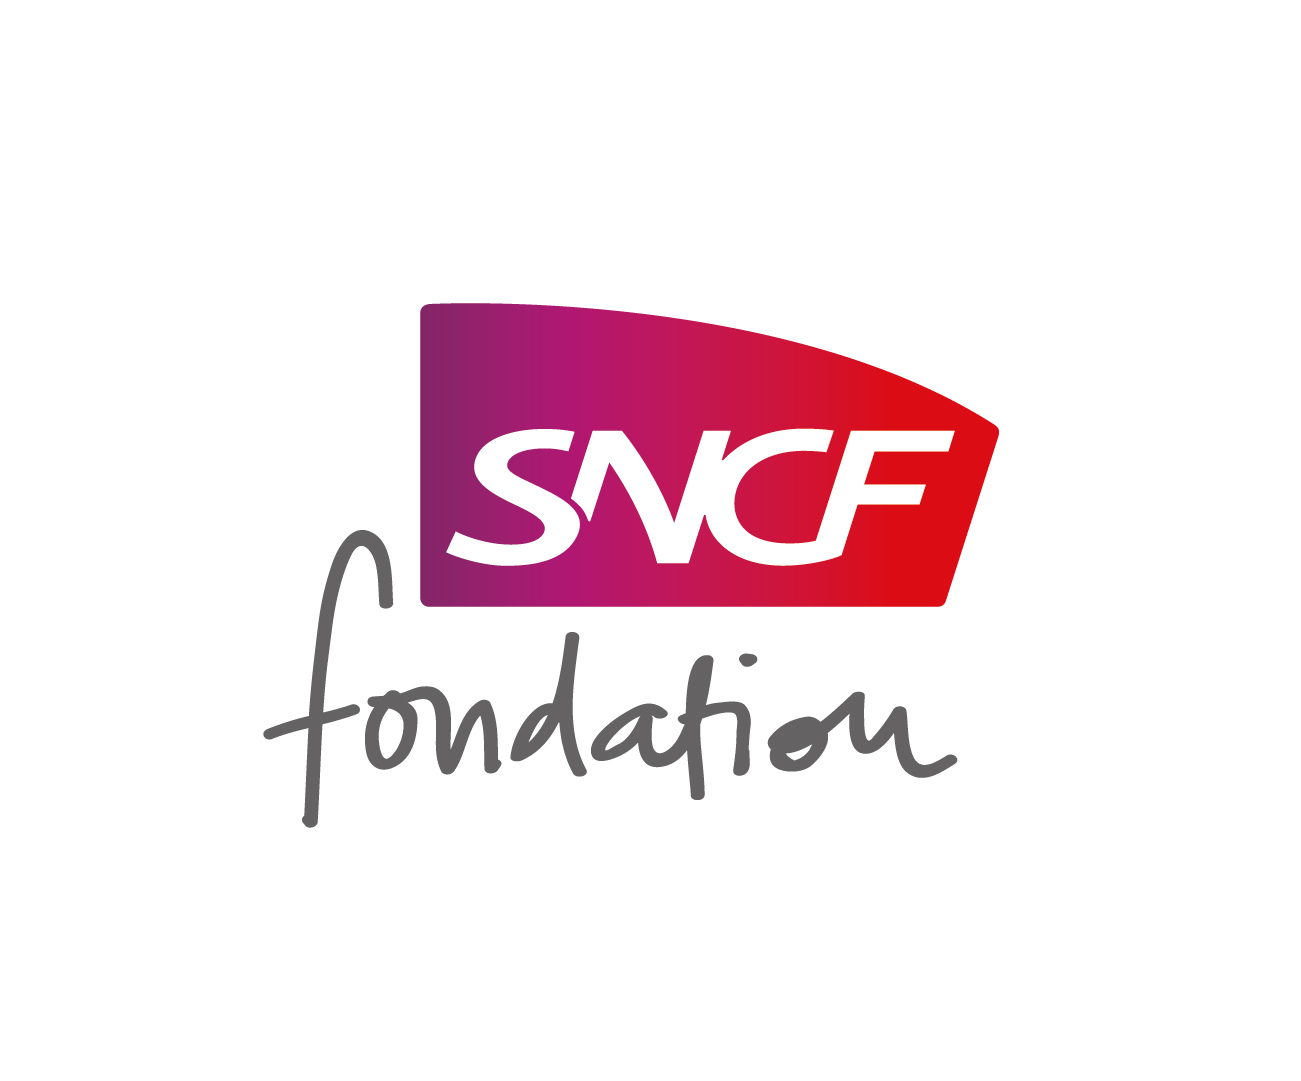 SNCF Foundation